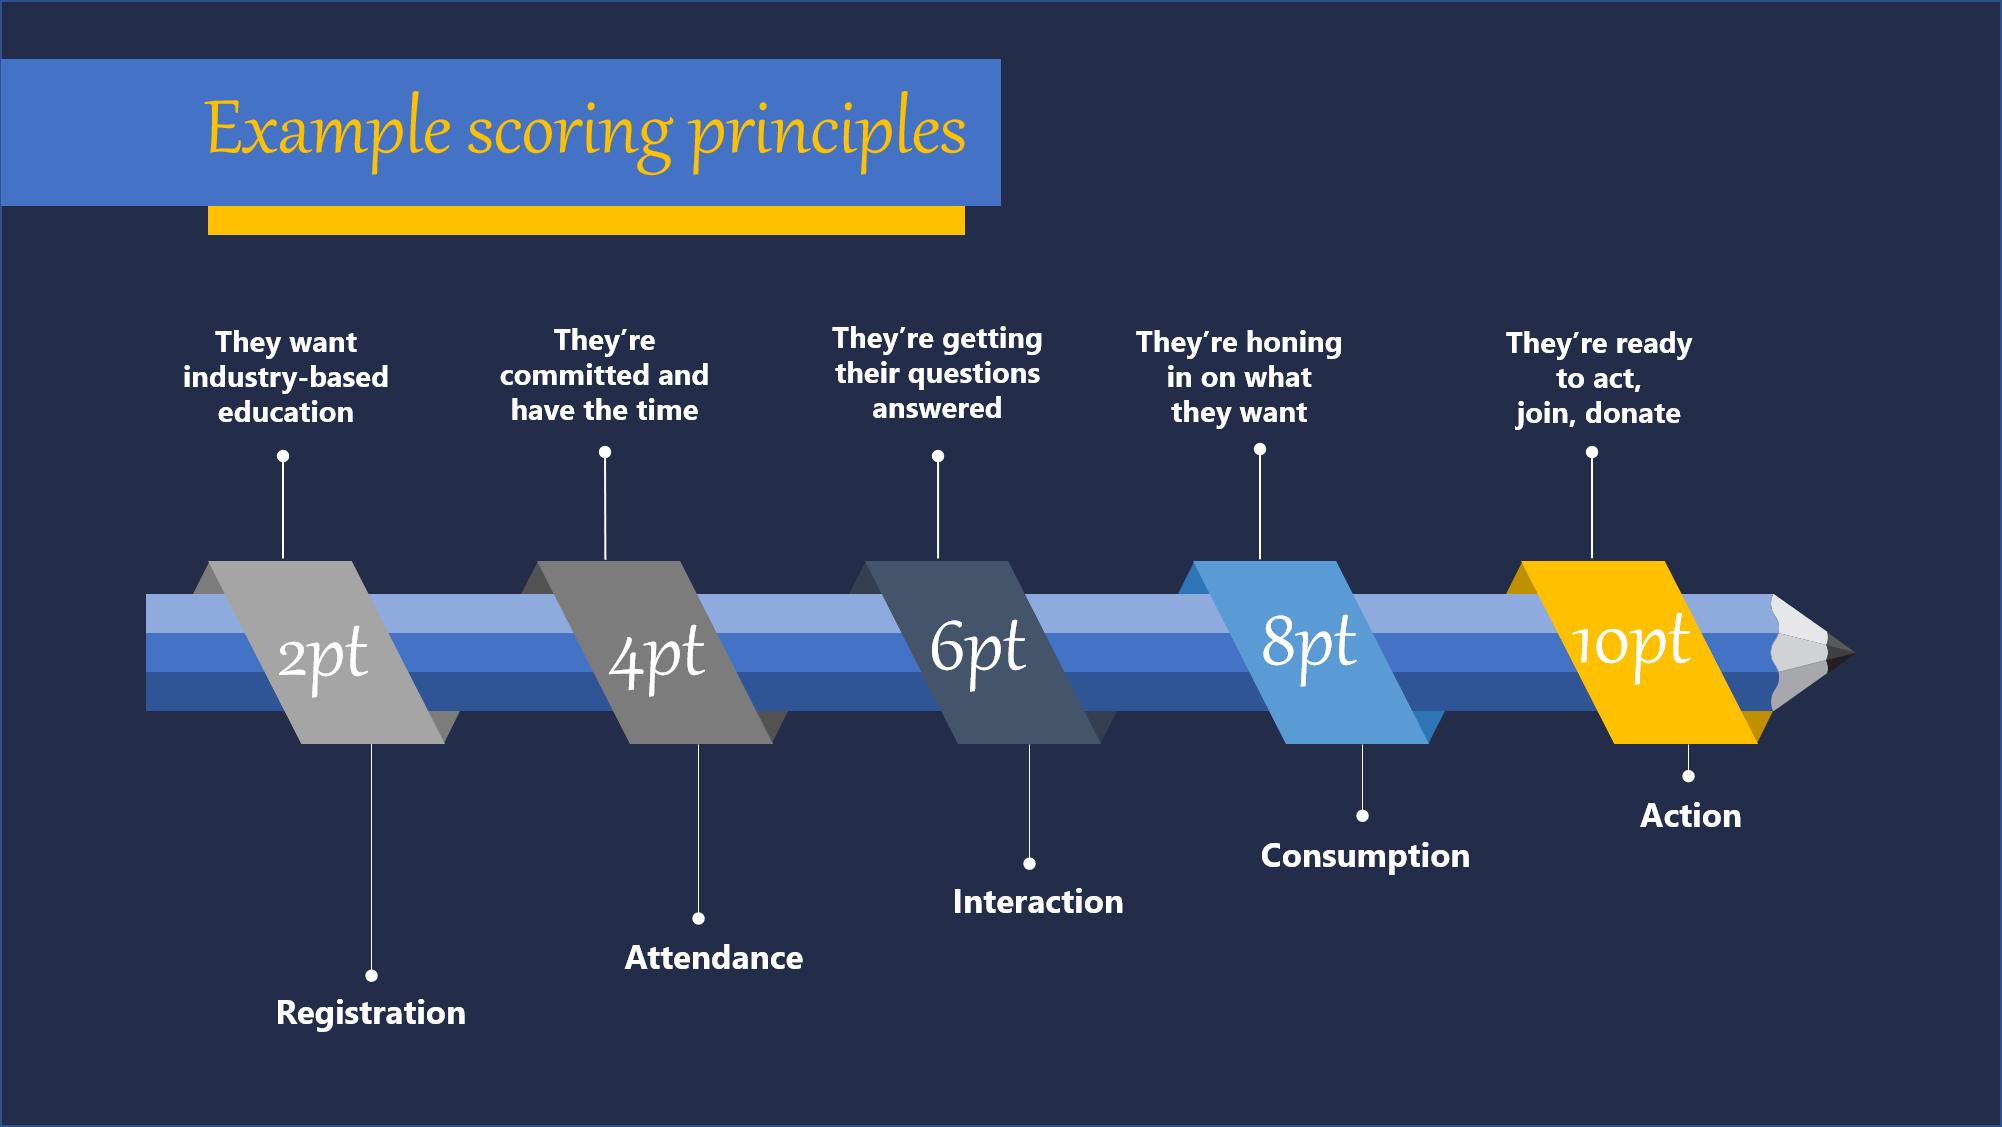 Conference Scoring Principles